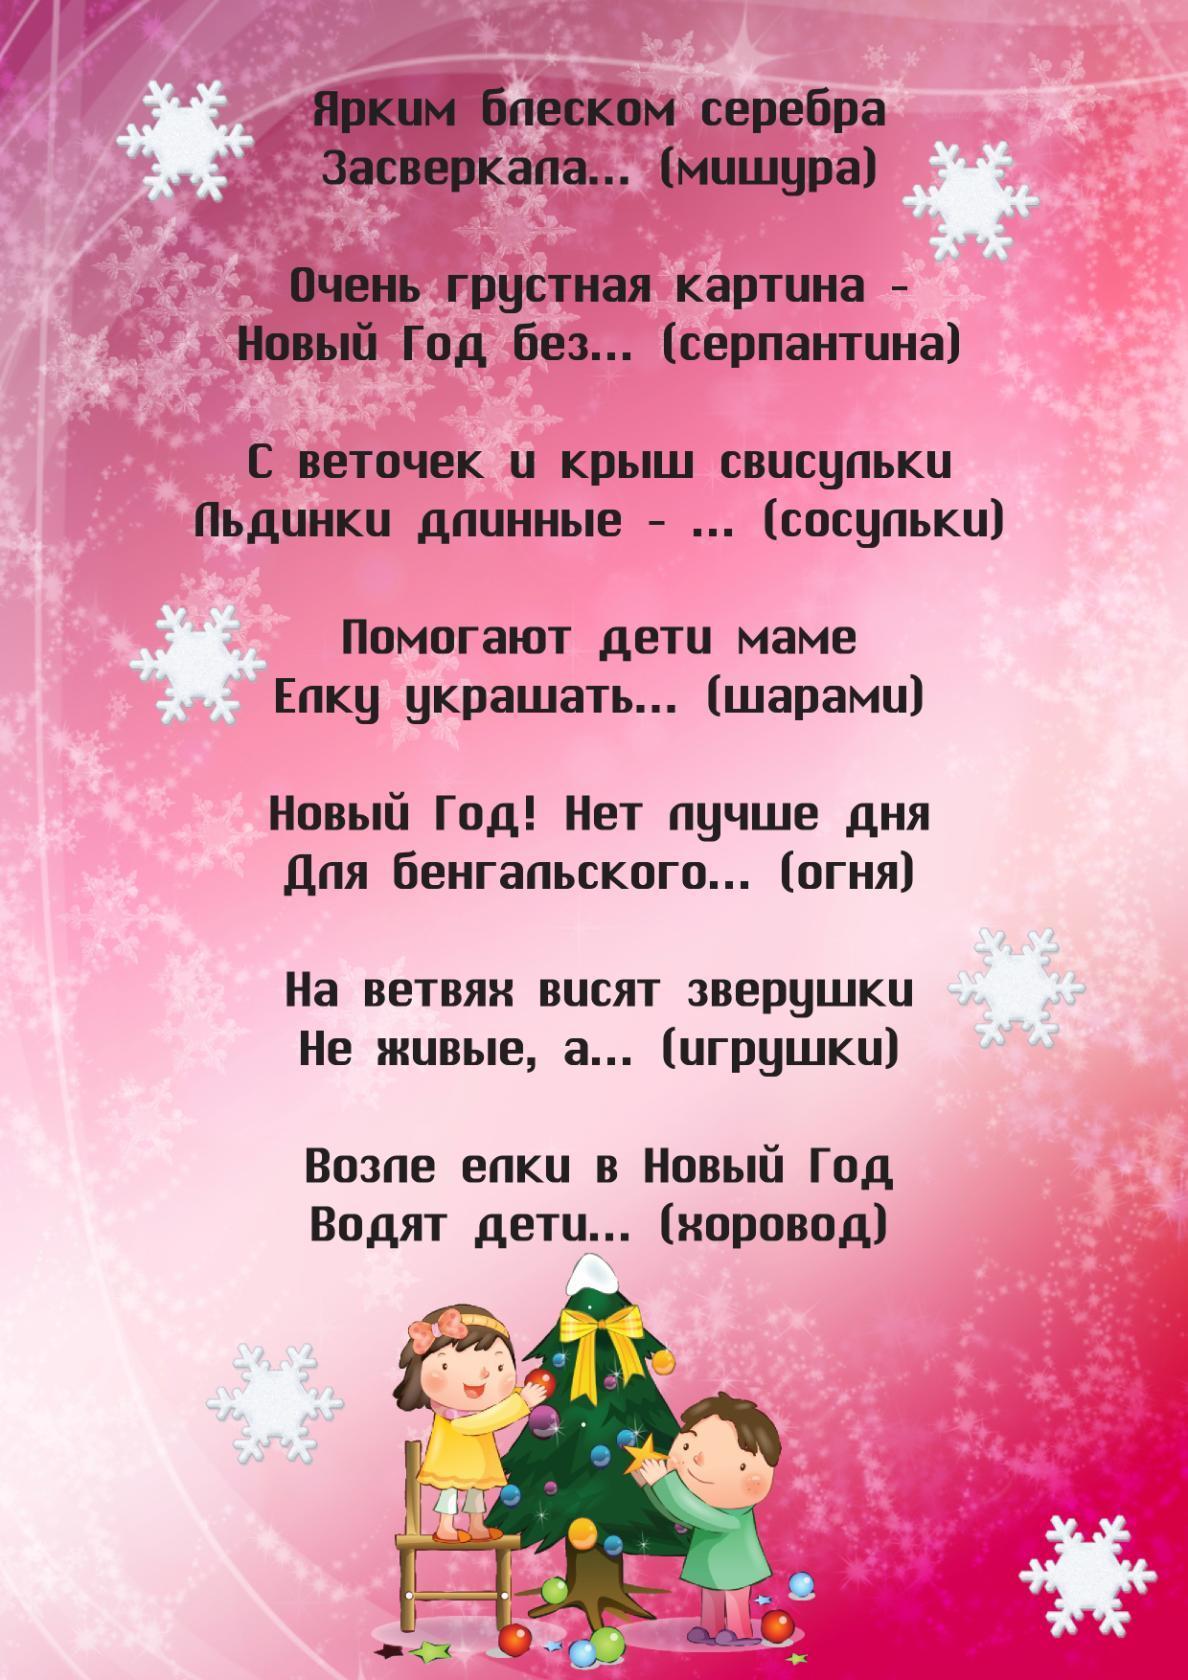 http://s2.uploads.ru/BOs3A.jpg